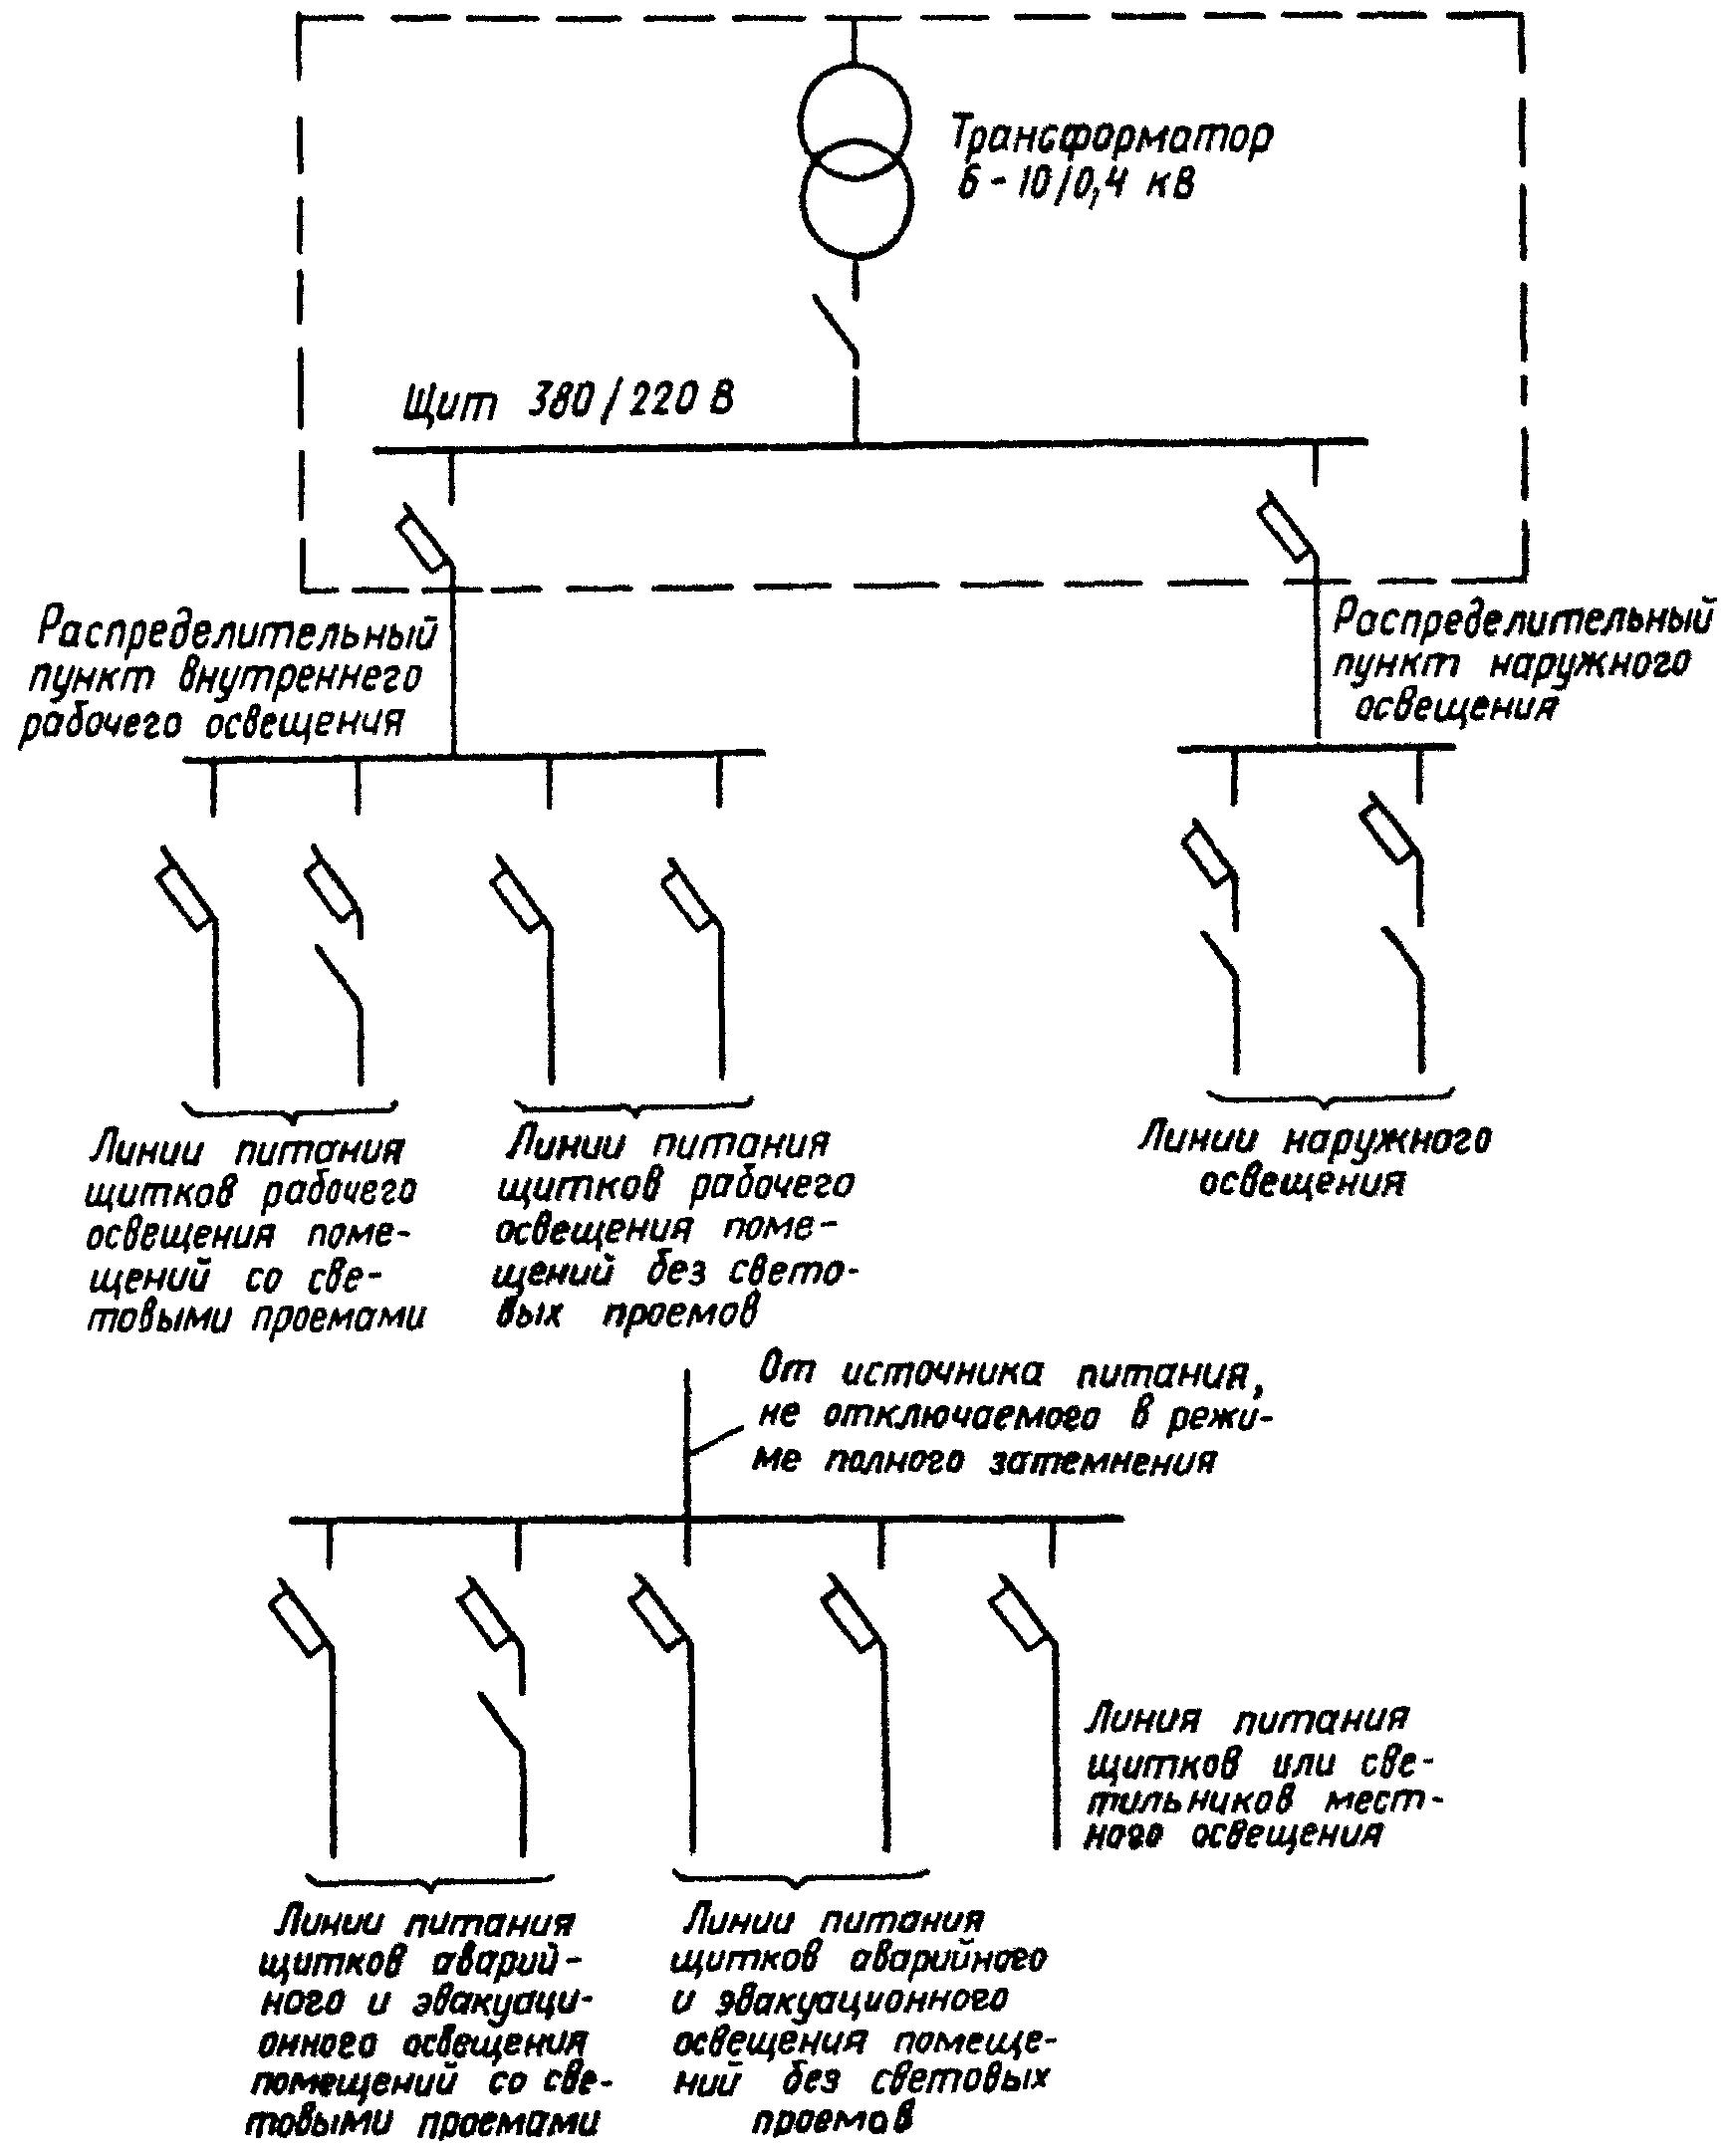 230 art-03 cn схема включения